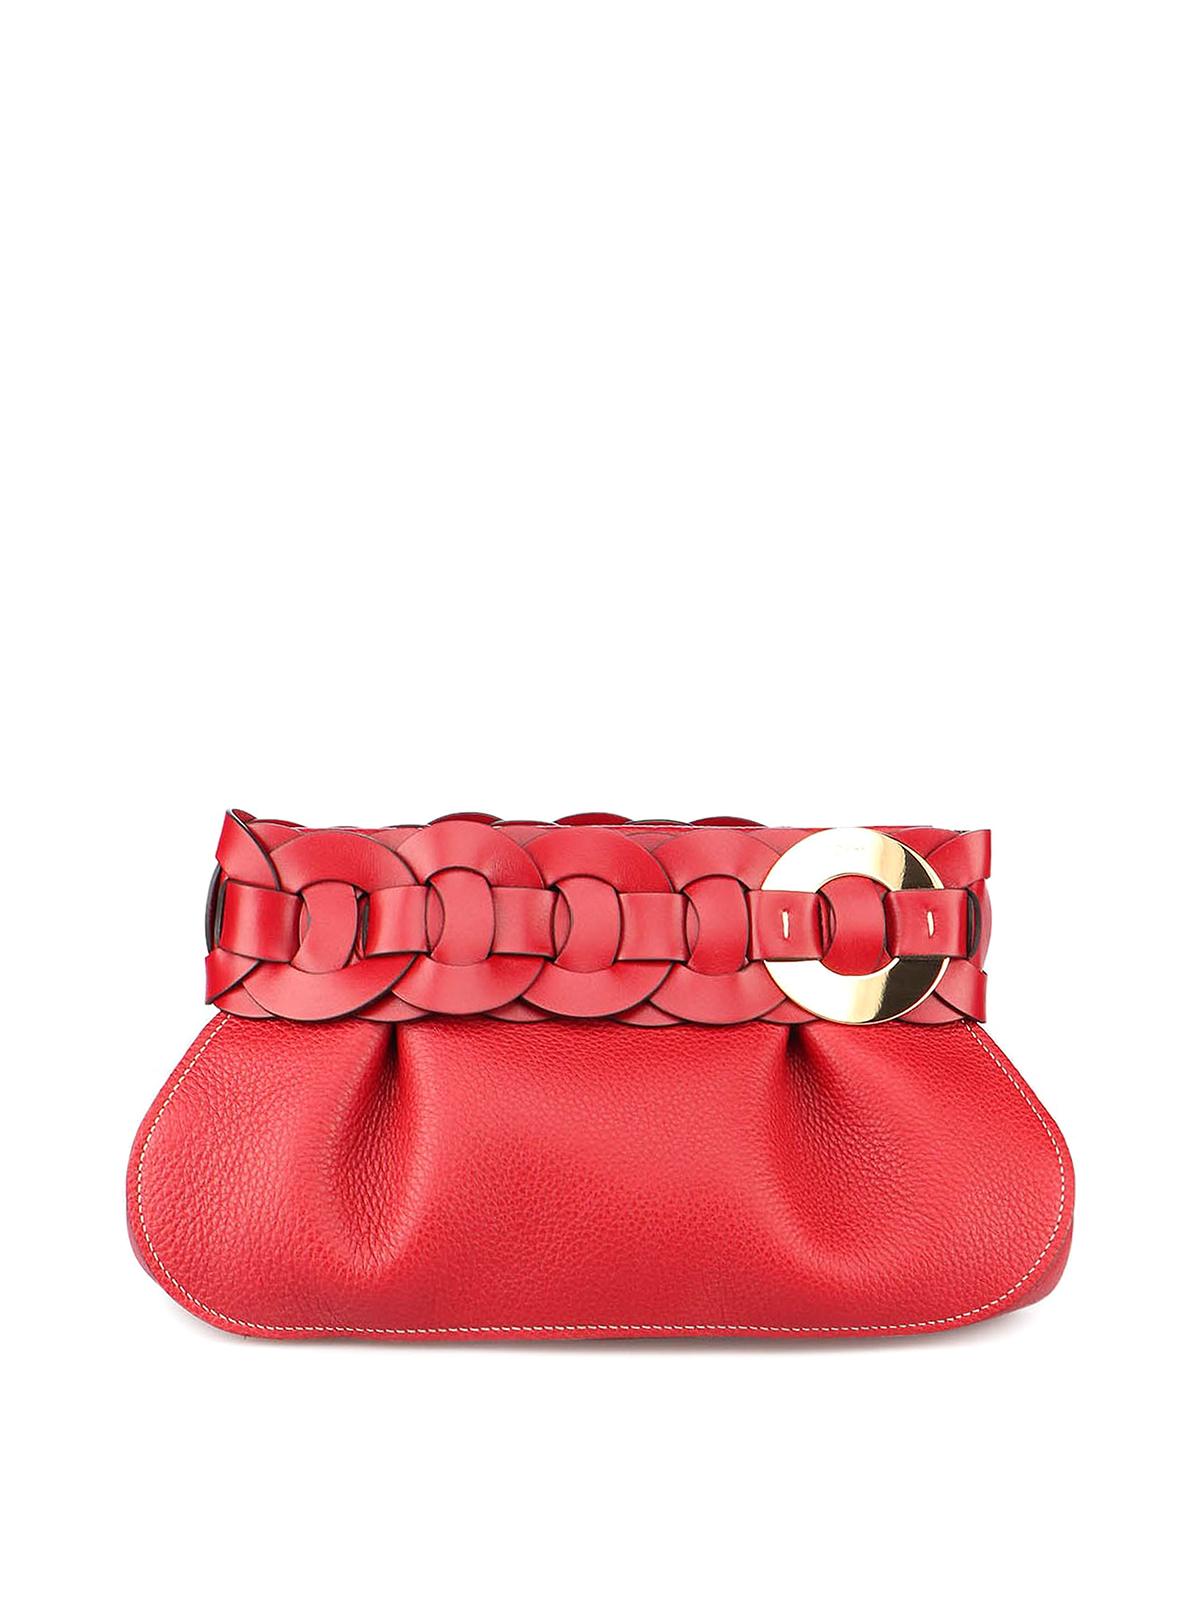 Chloé Darryl Clutch Bag In Red